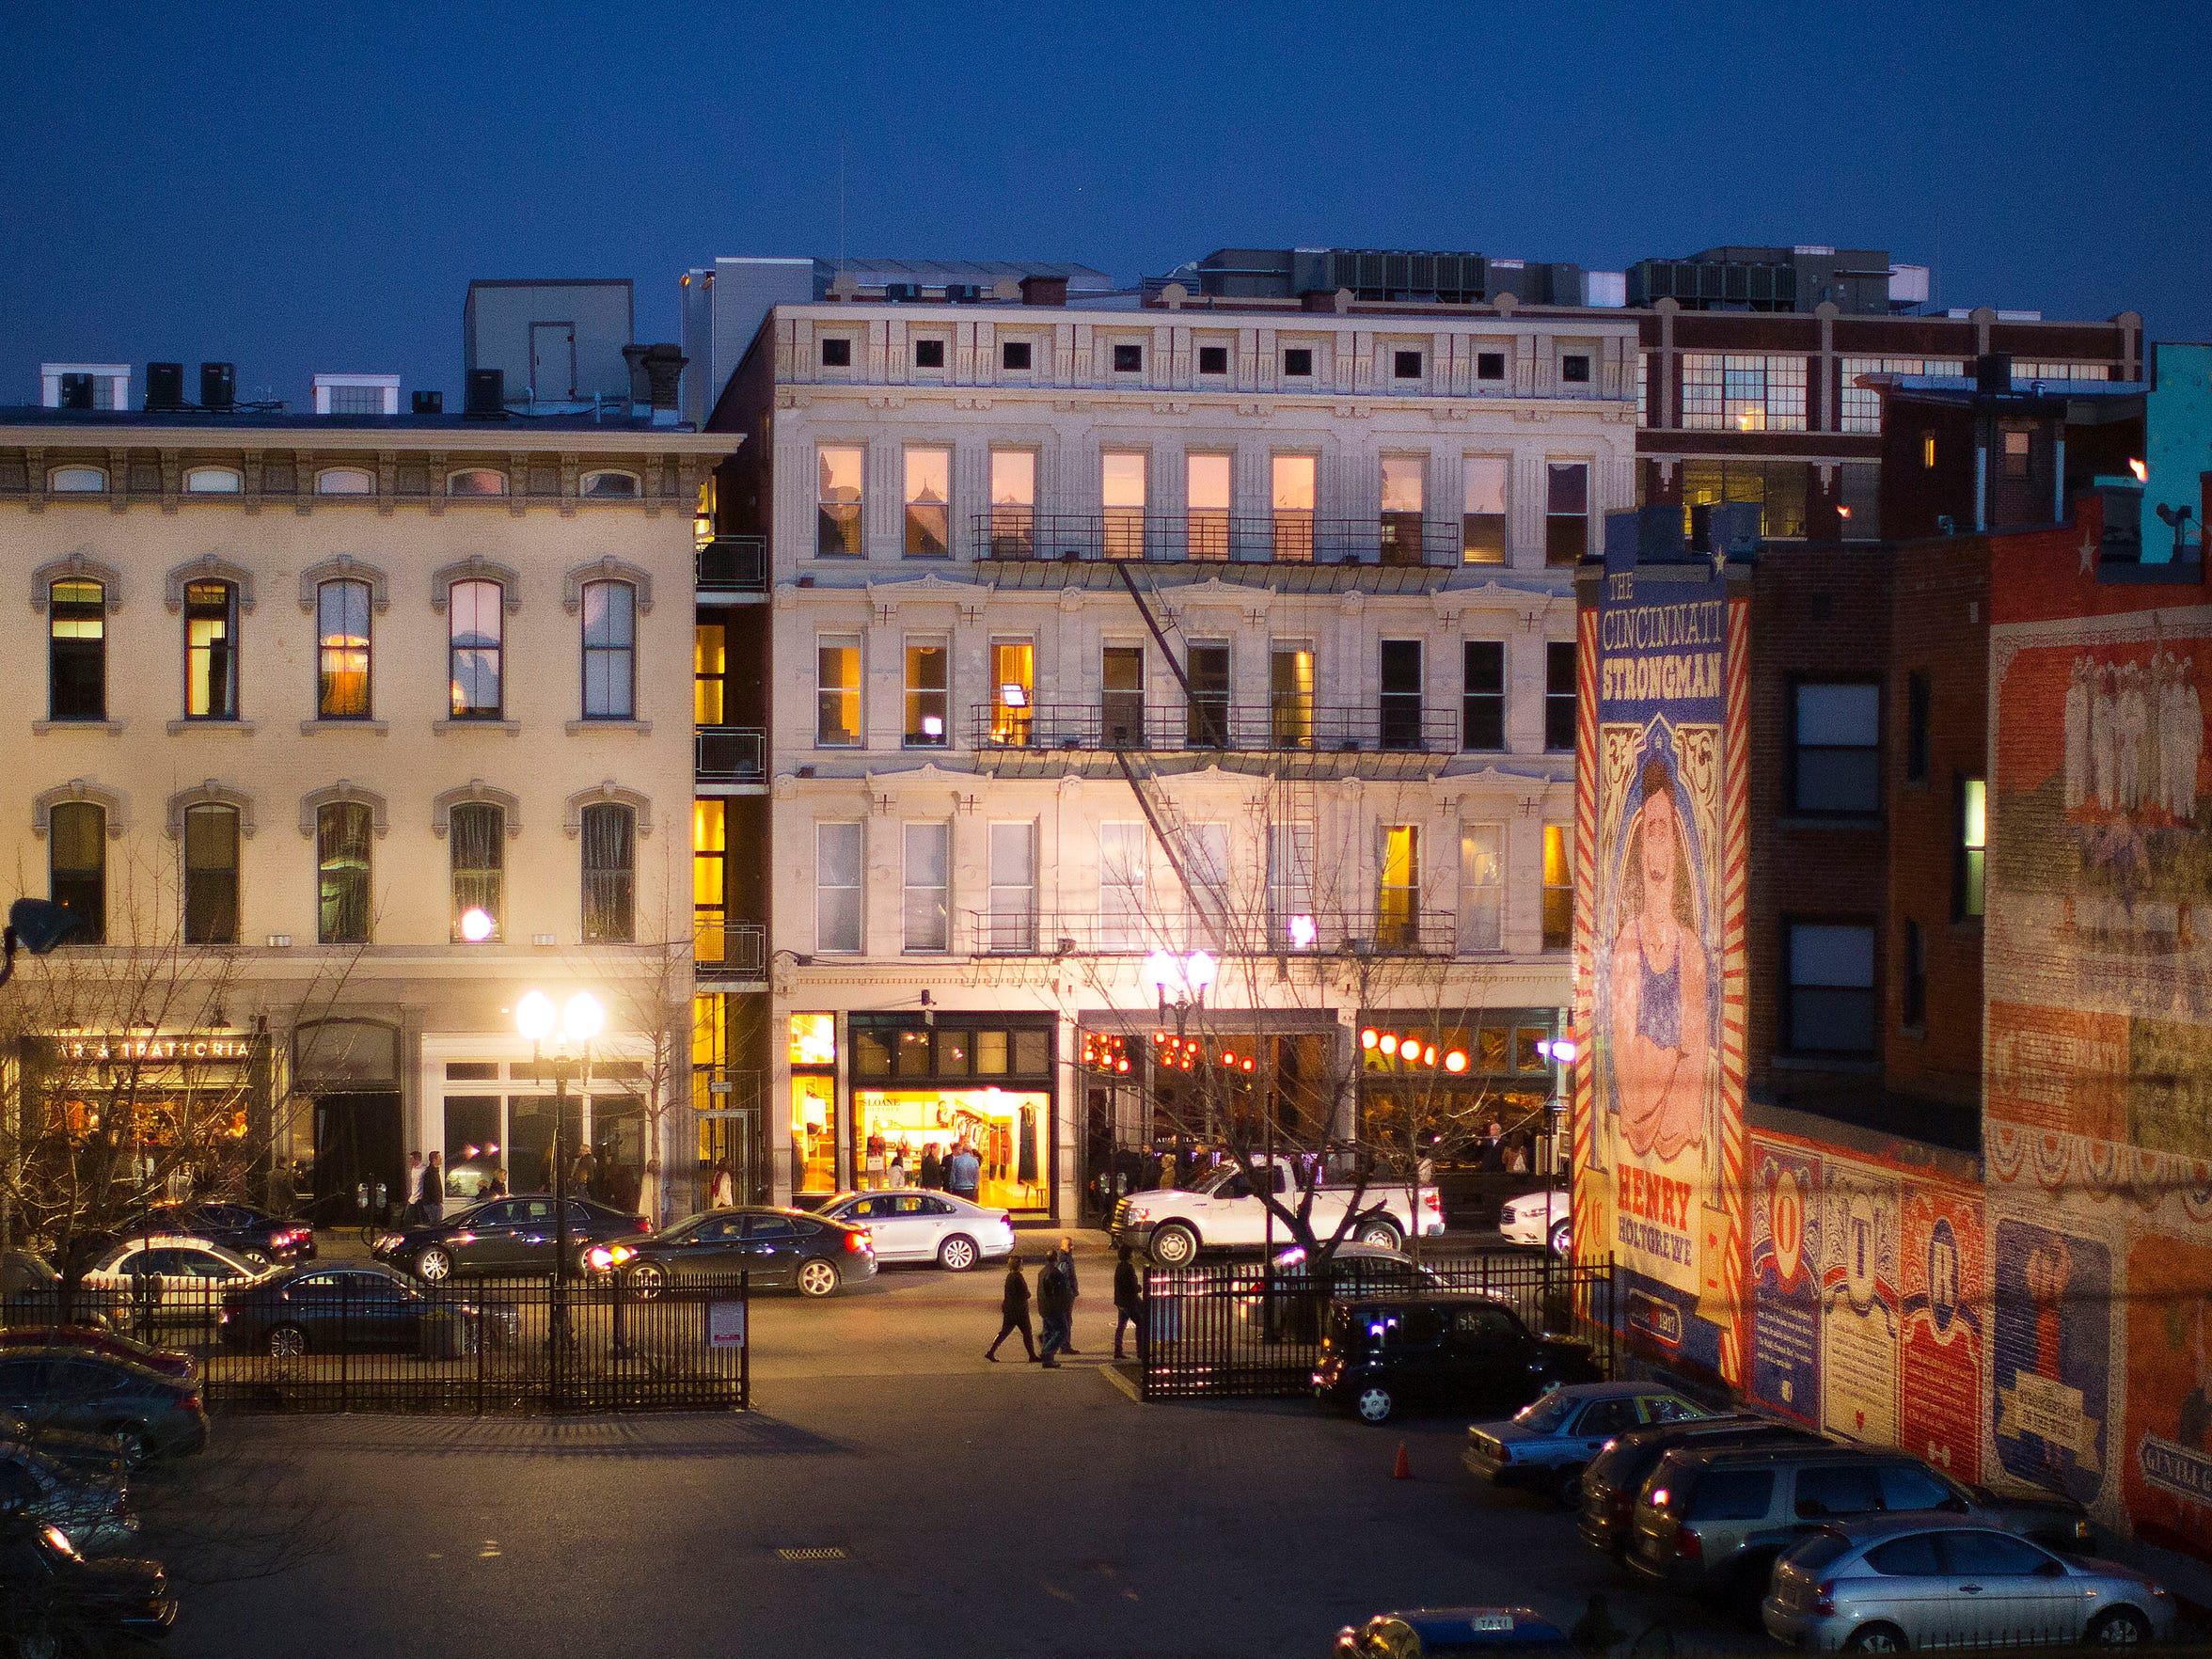 The view of Vine Street from Anntoinette Jones' apartment.